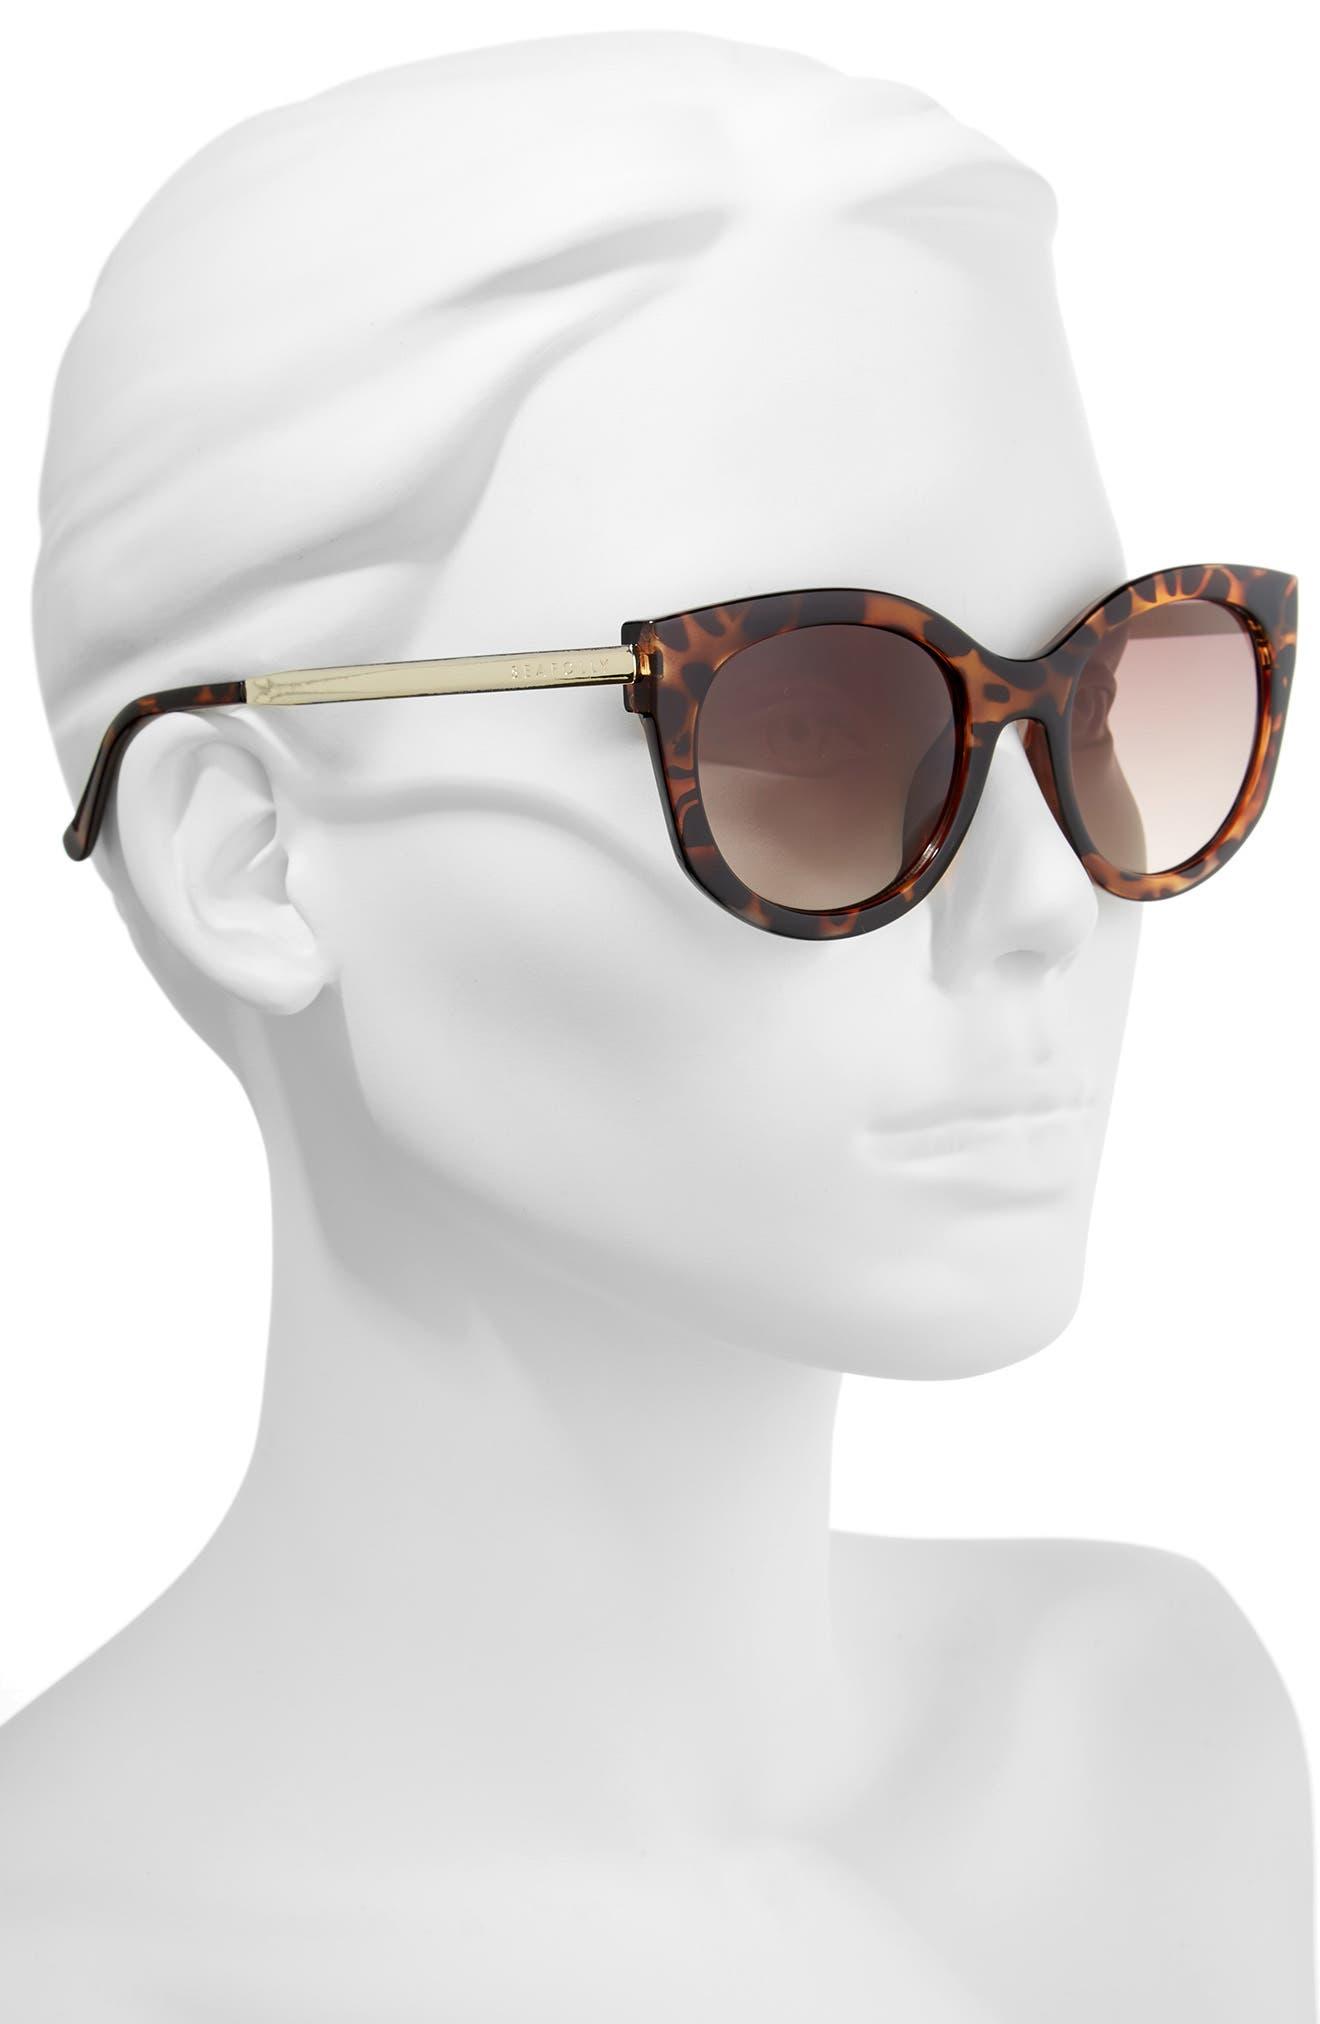 Long Beach 51mm Cat Eye Sunglasses,                             Alternate thumbnail 2, color,                             DARK TORT